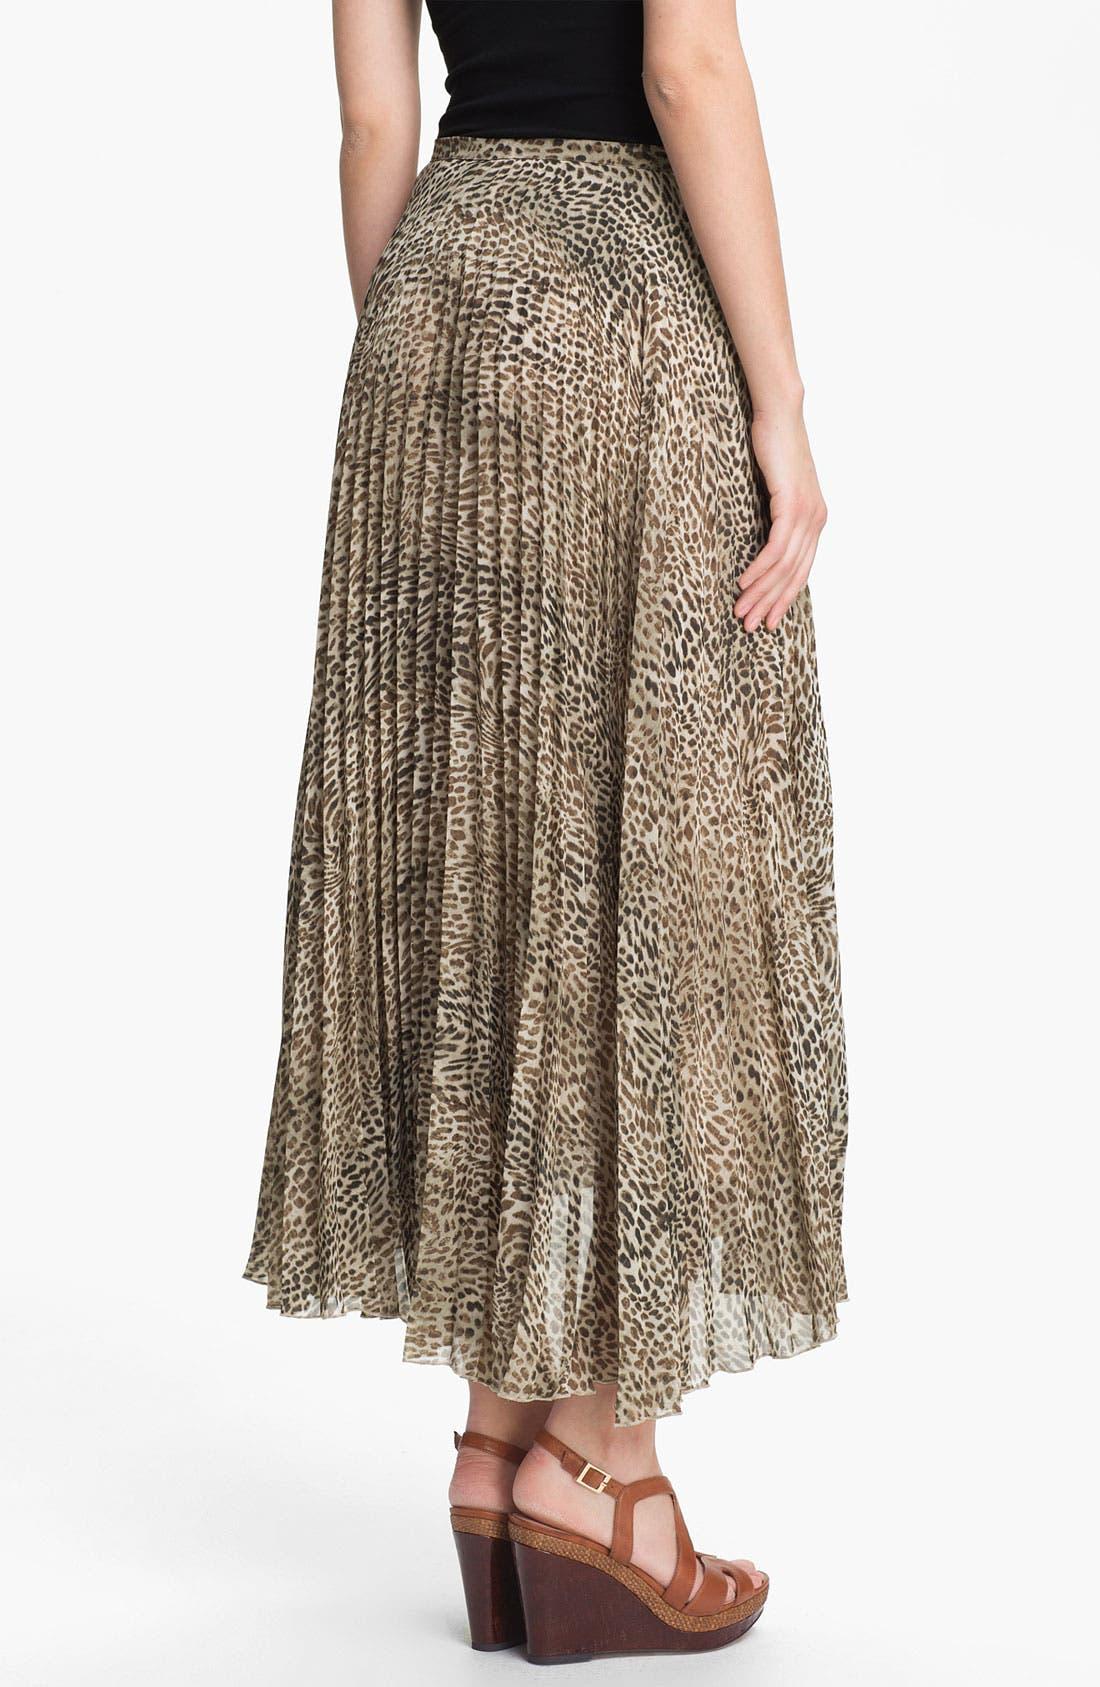 Cheetah Print Crystal Pleat Midi Skirt,                             Alternate thumbnail 3, color,                             271